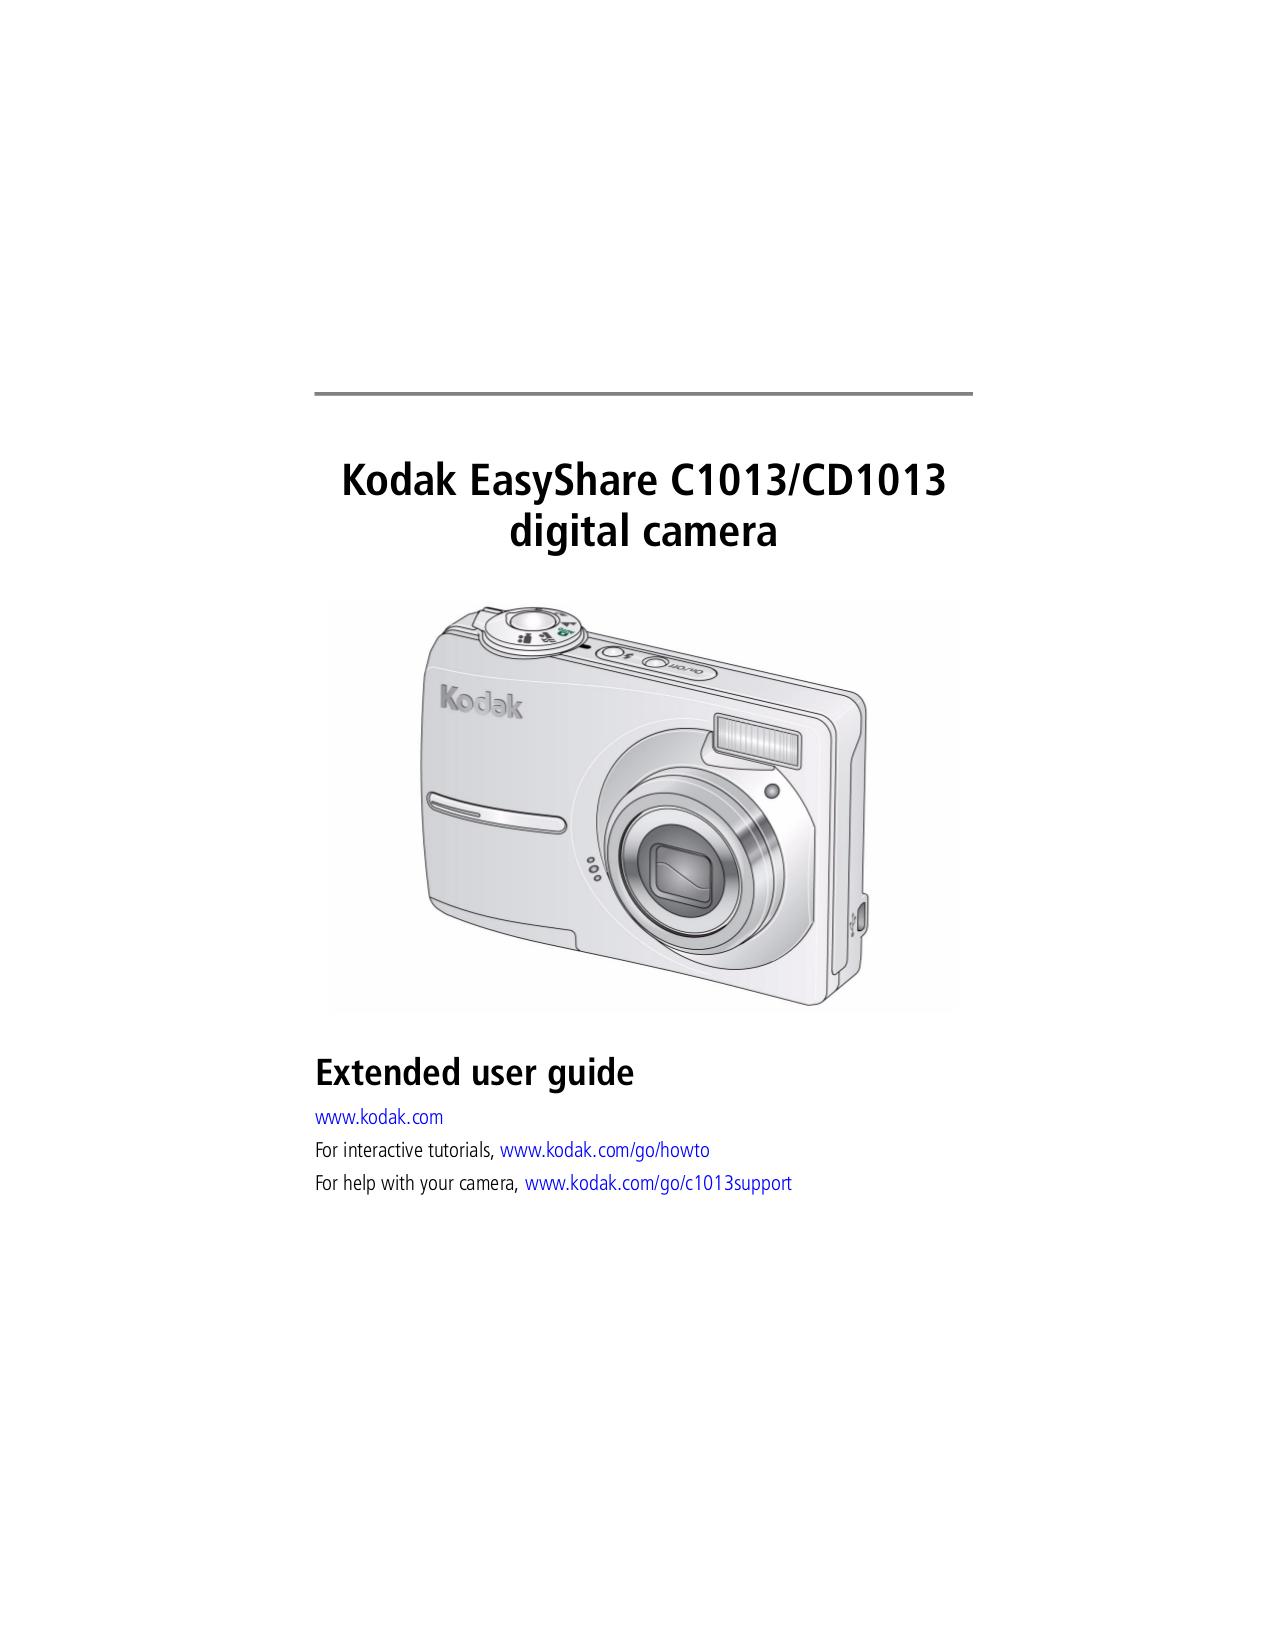 pdf for Kodak Digital Camera EasyShare C1013 manual